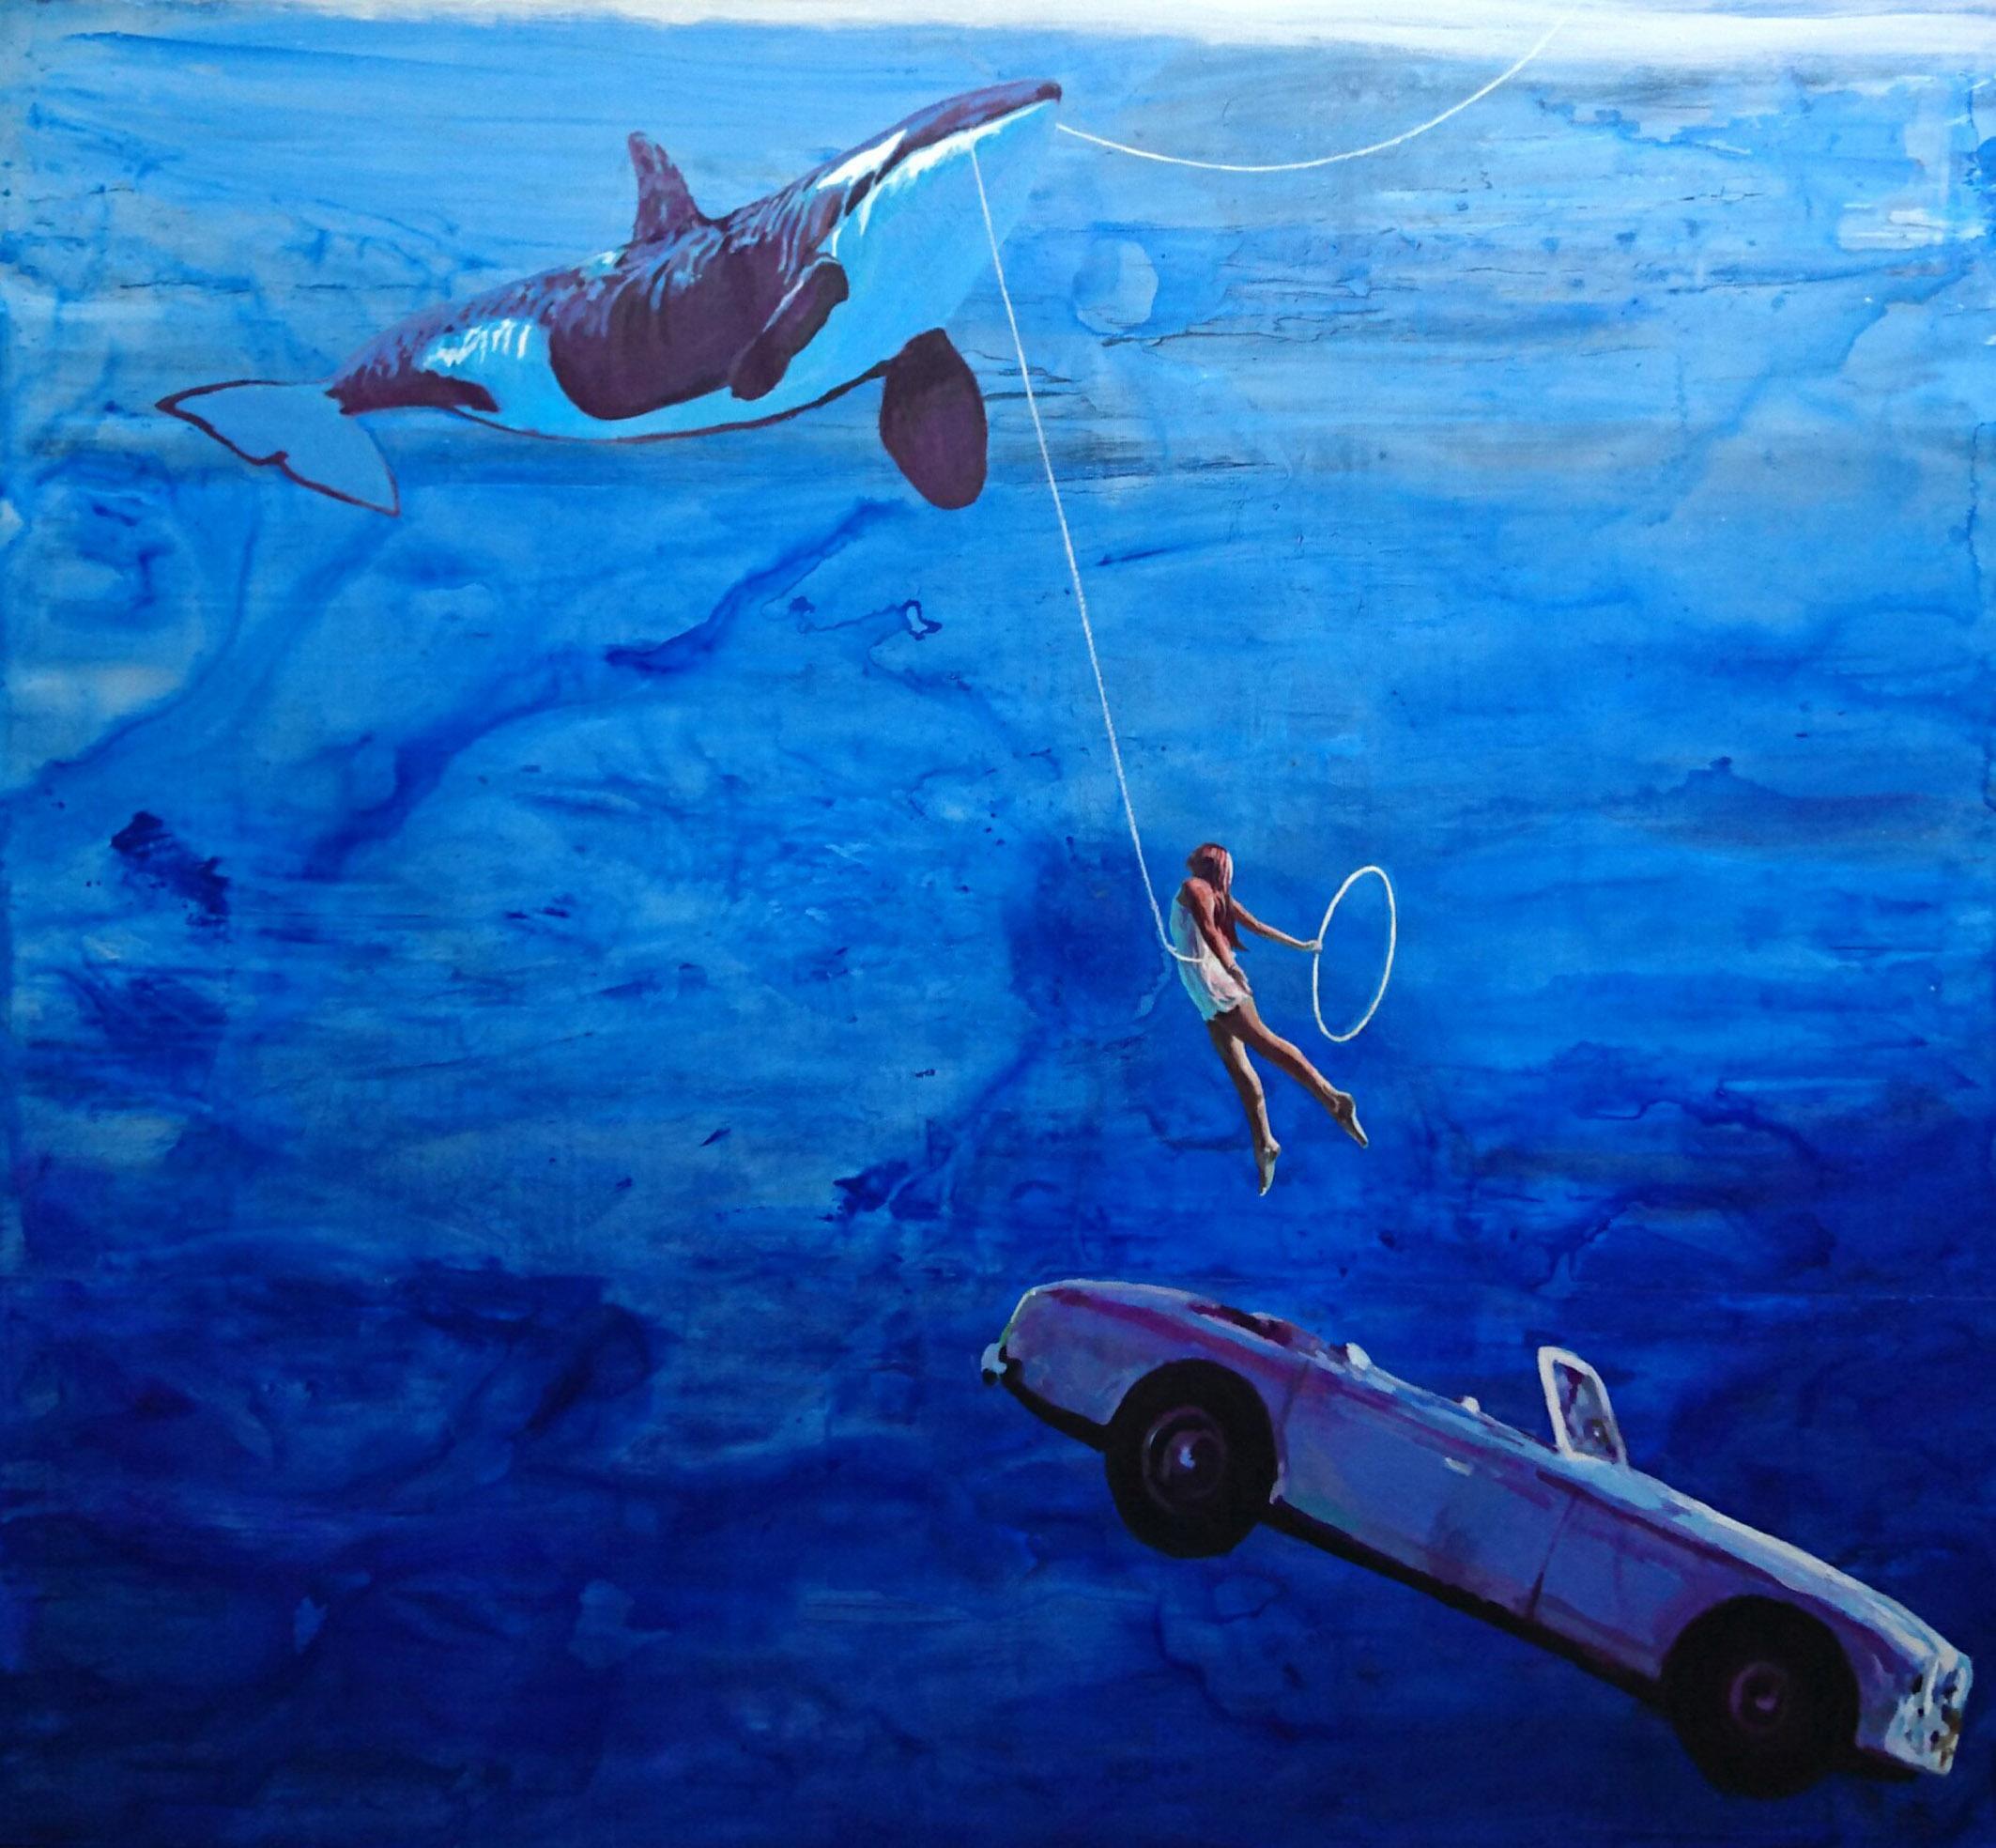 'Bahama girl'. 176x190 cm. Acrílico y resina sobre tabla